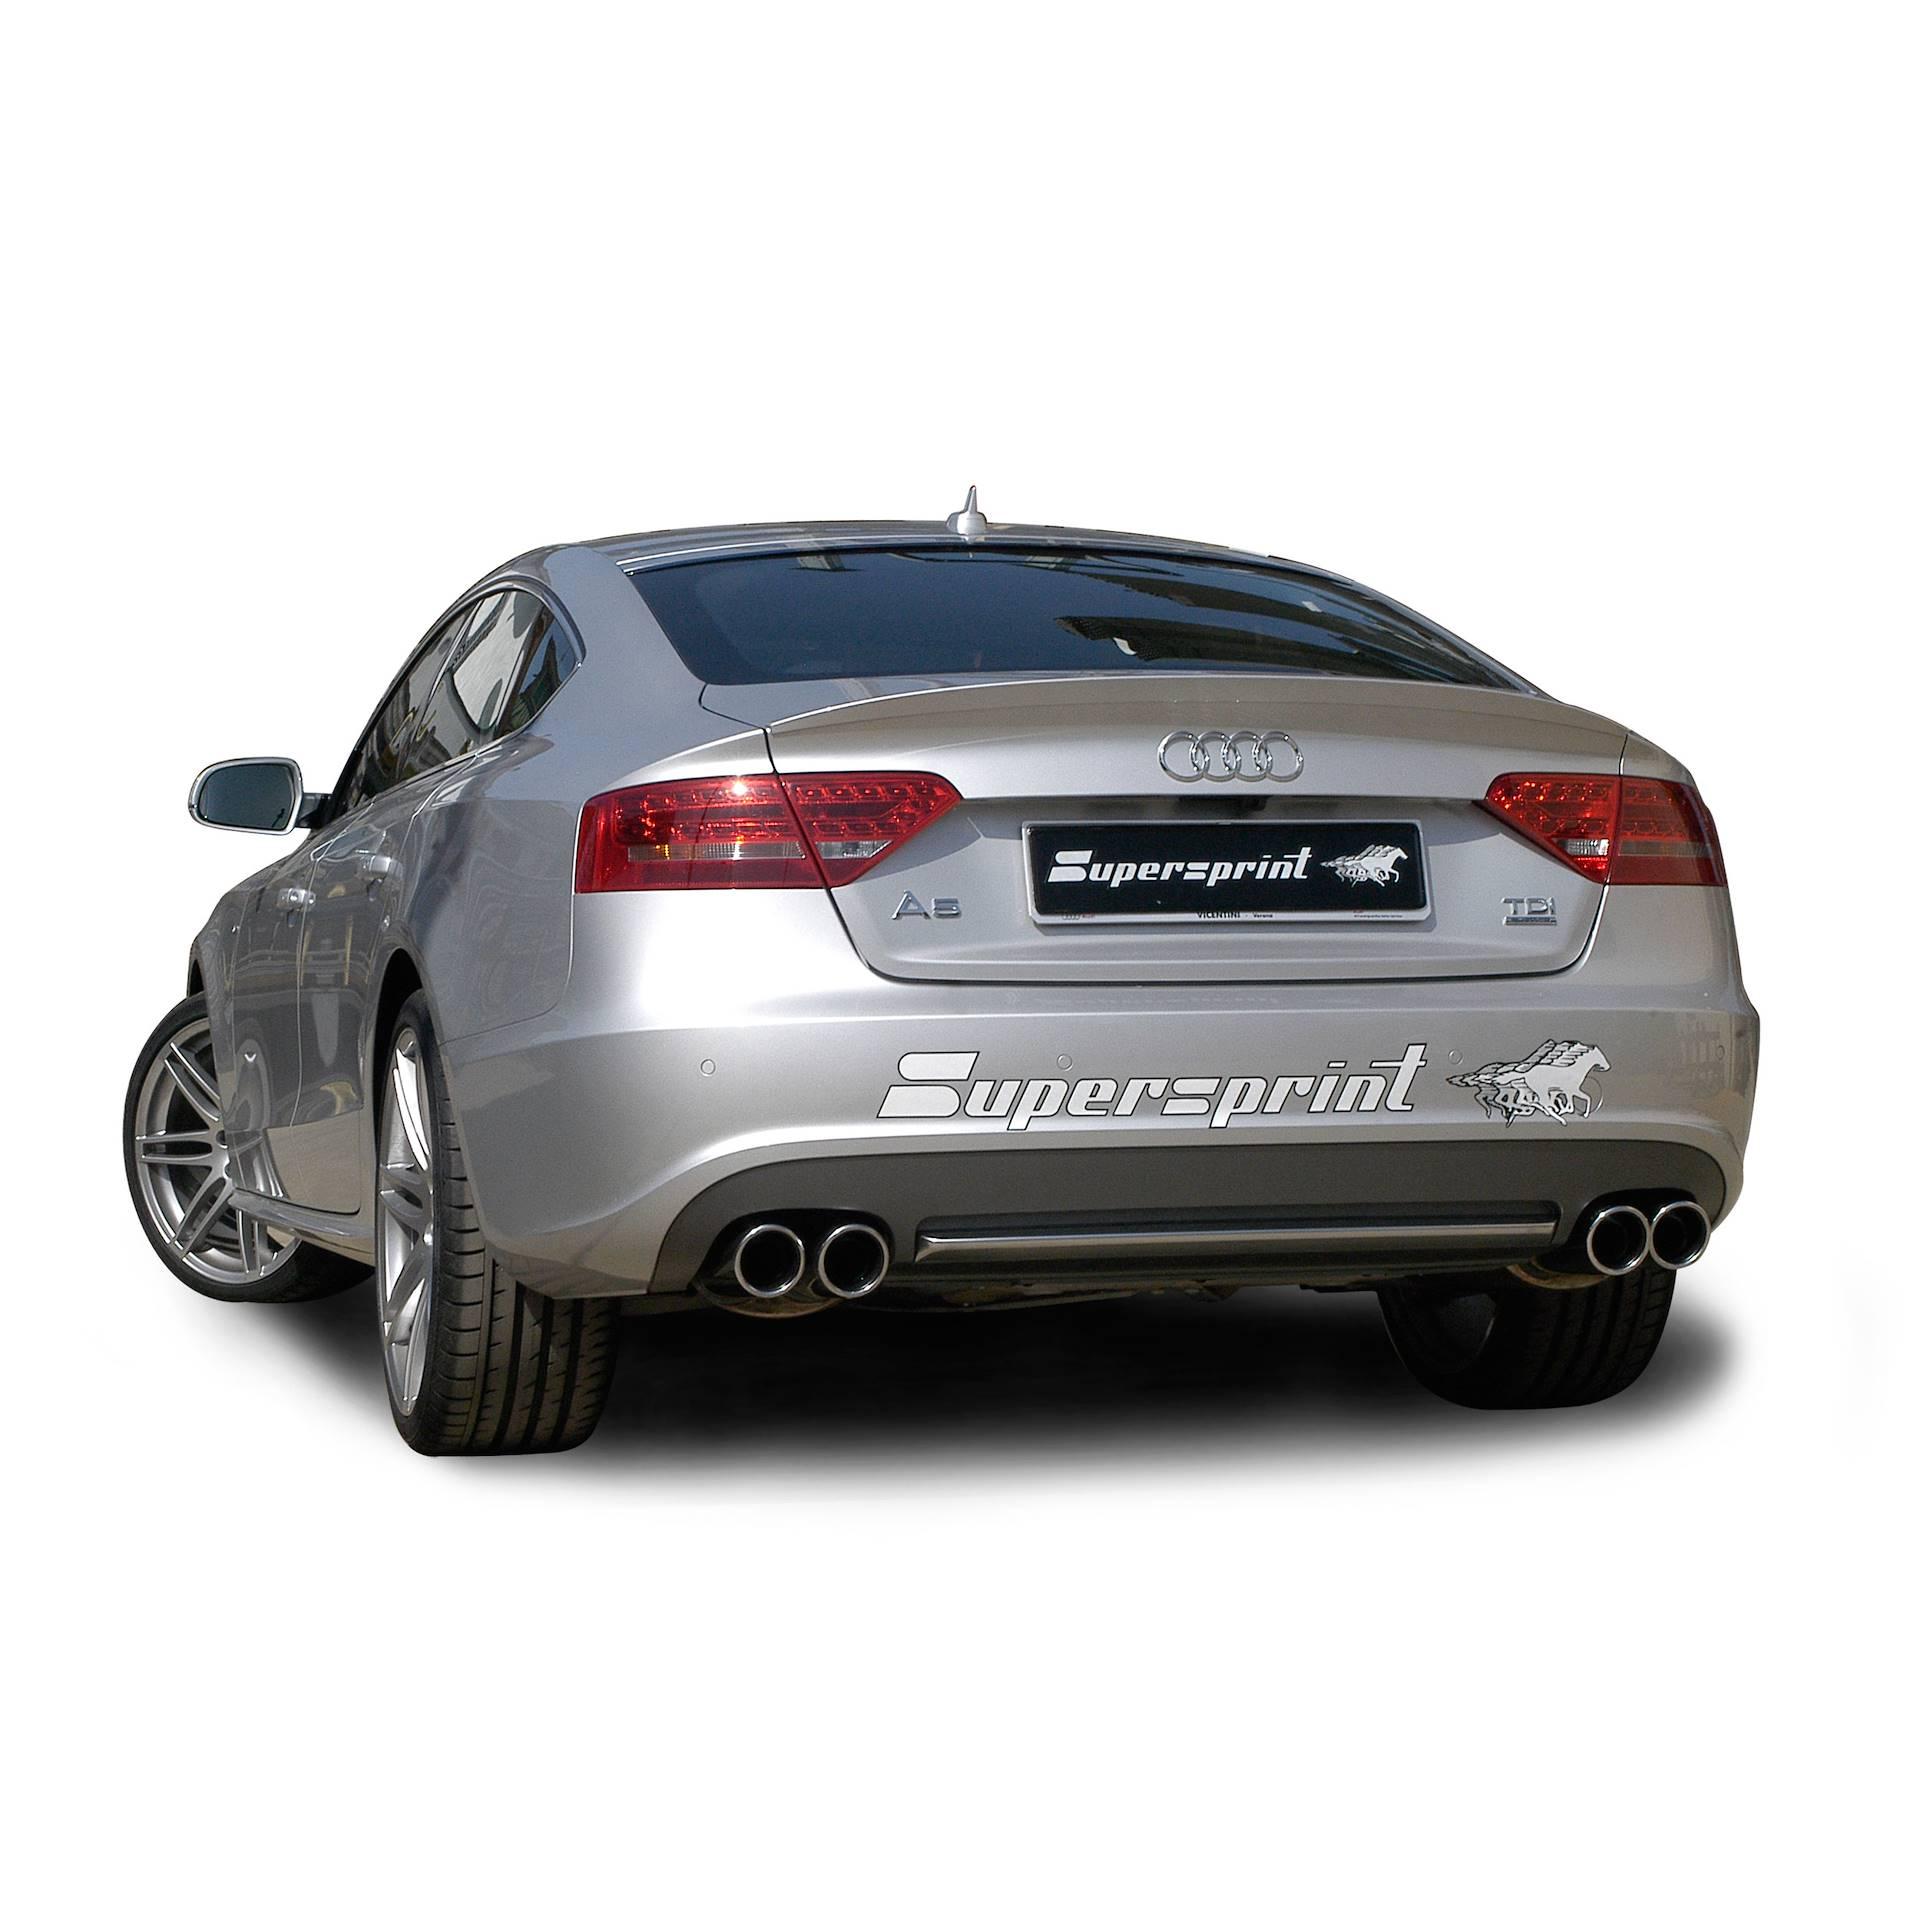 AUDI A5 Sportback QUATTRO 2.0 TFSI (211